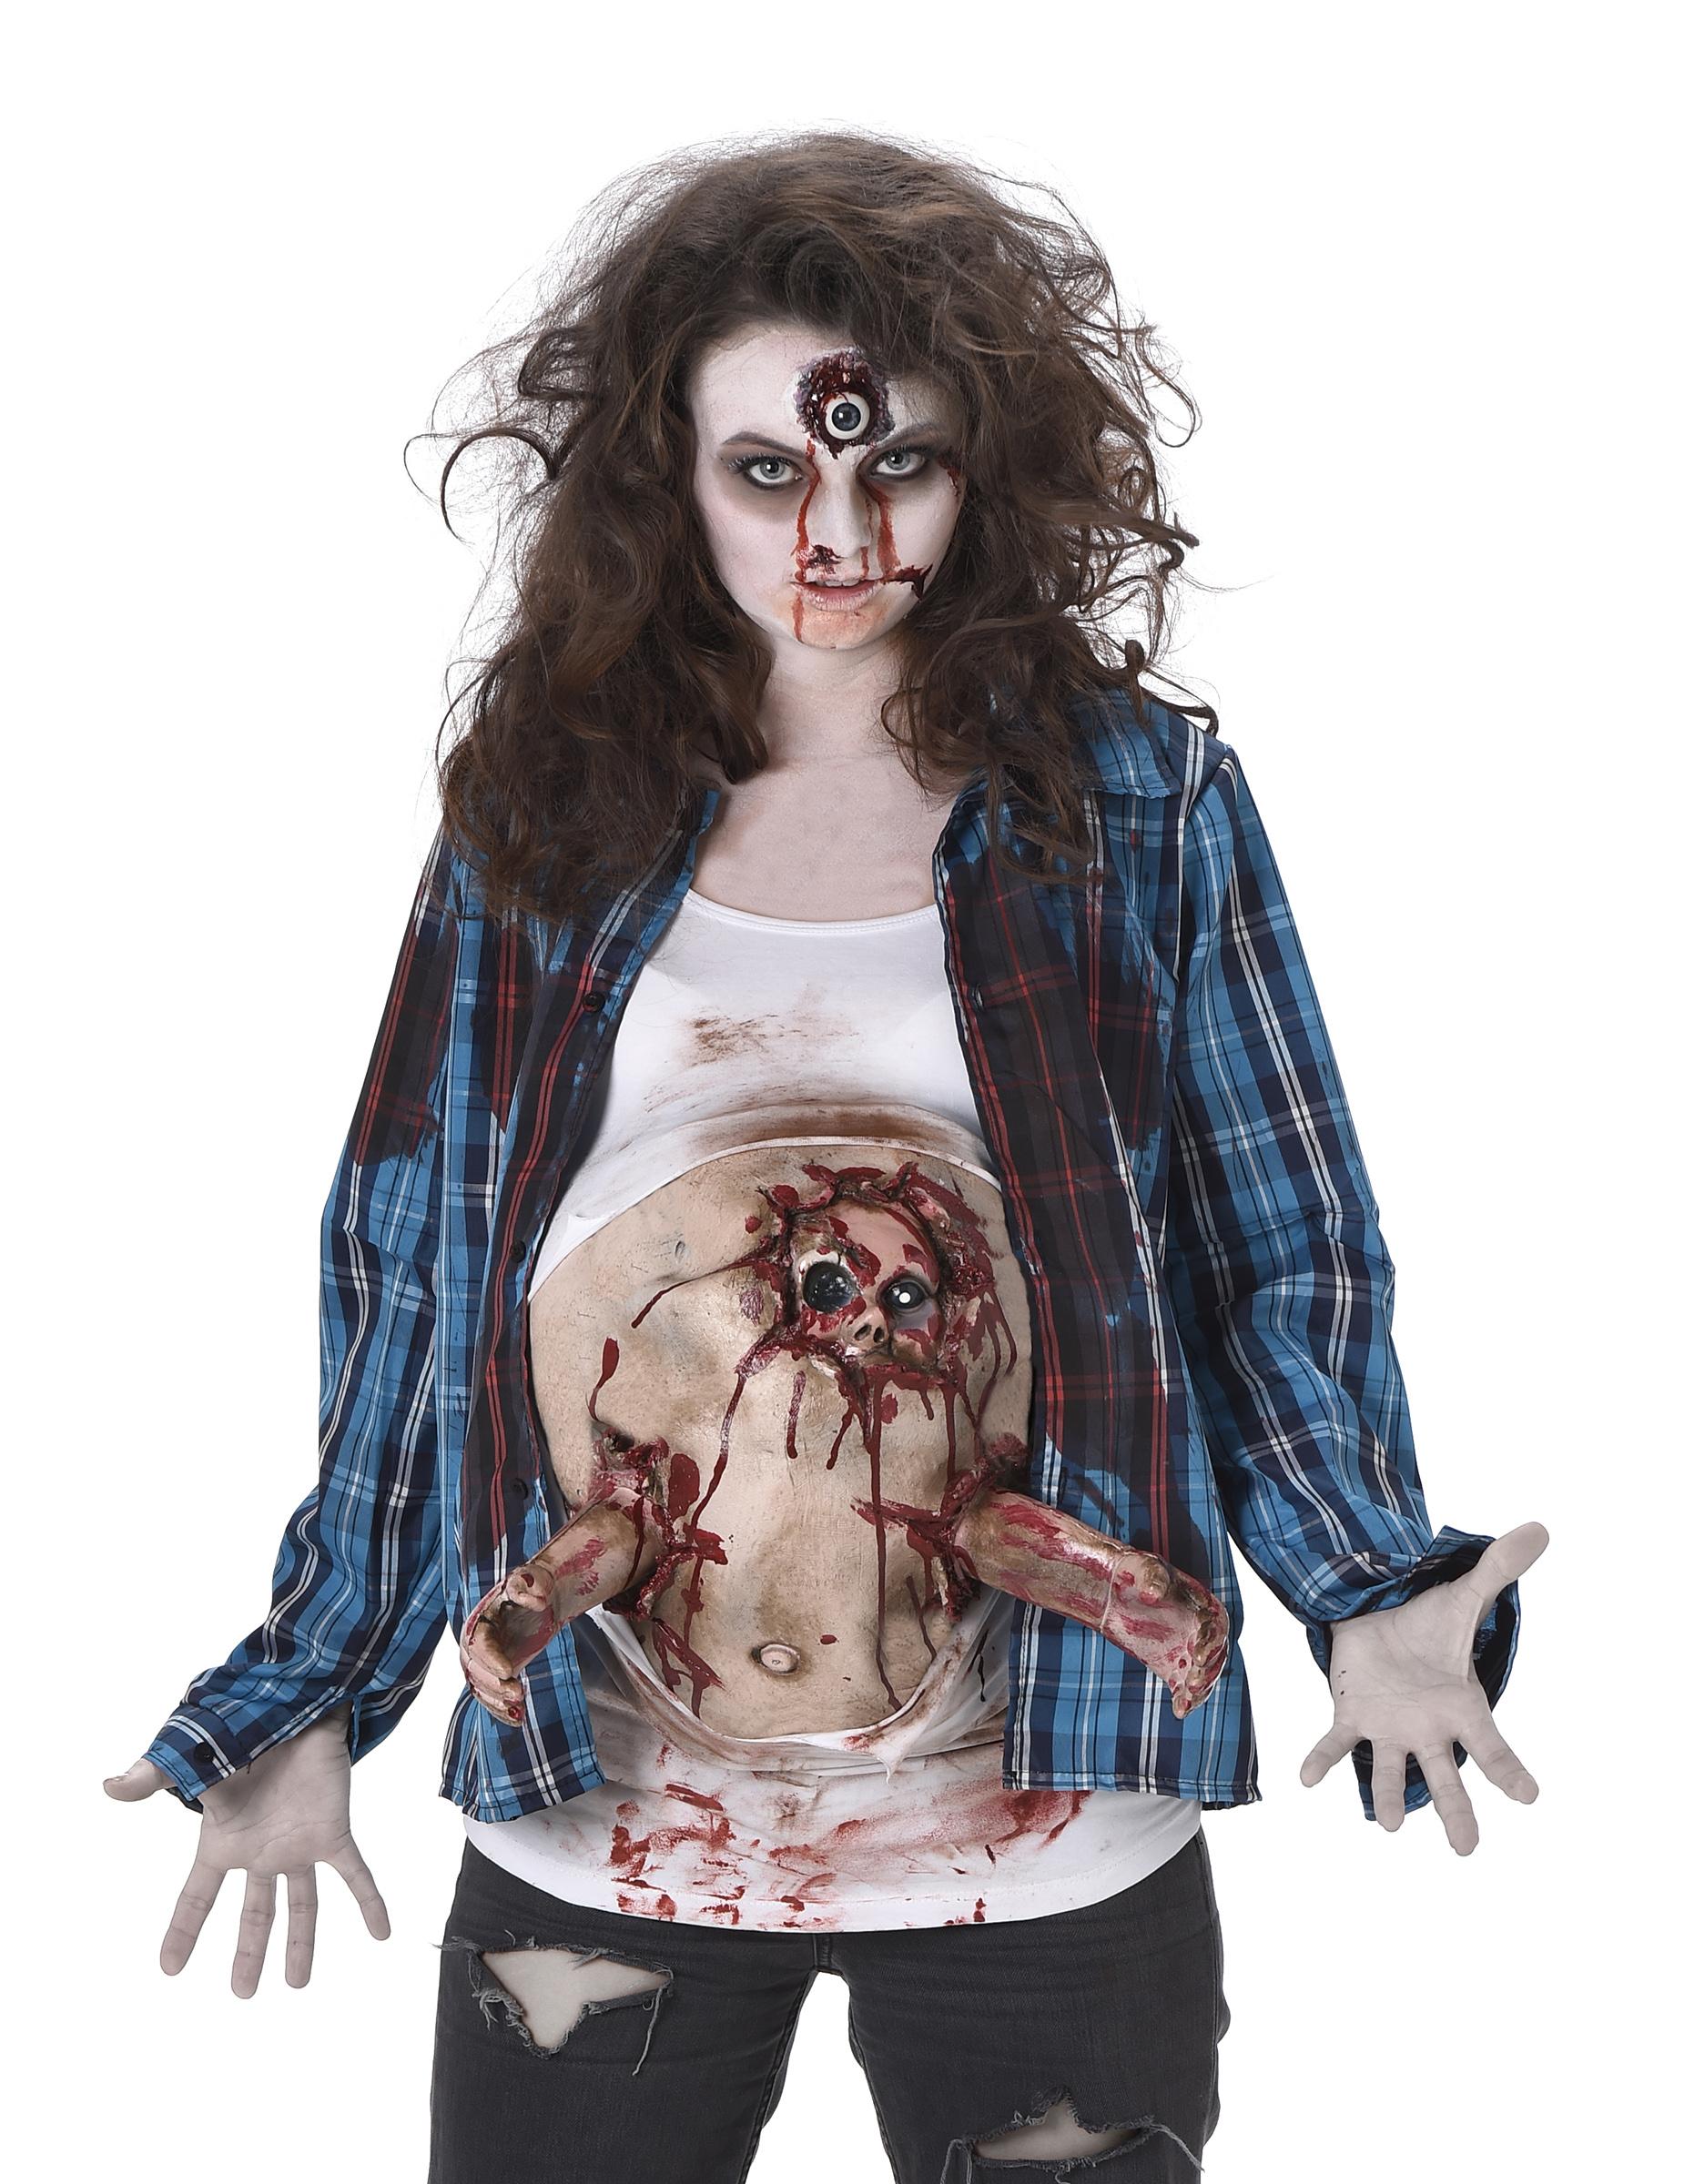 Gravid zombie - Halloweenkostym för vuxna-1 6bd8a9836d62e